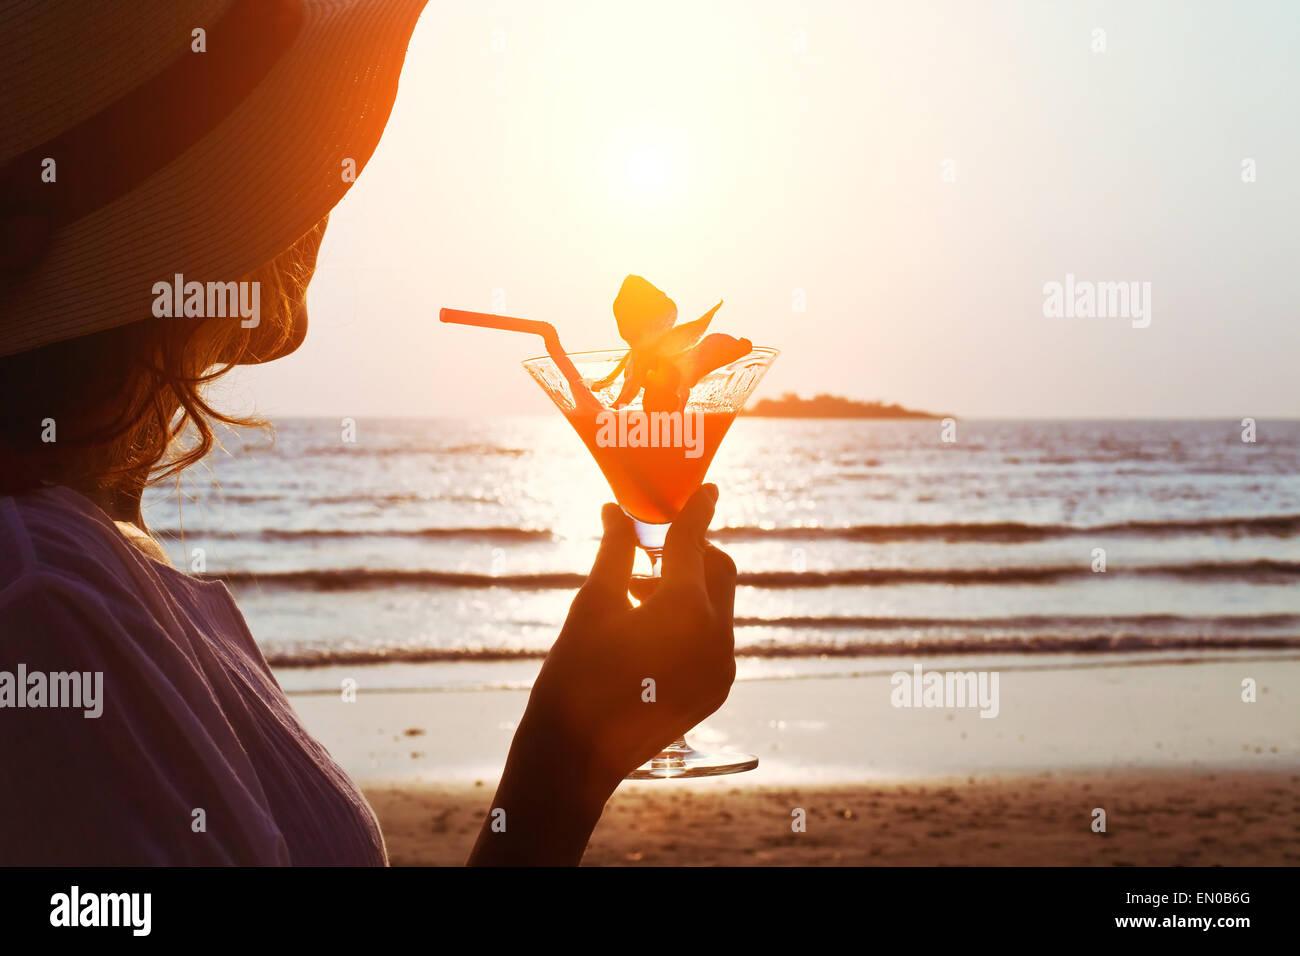 Frau mit Cocktail am Strand Stockbild